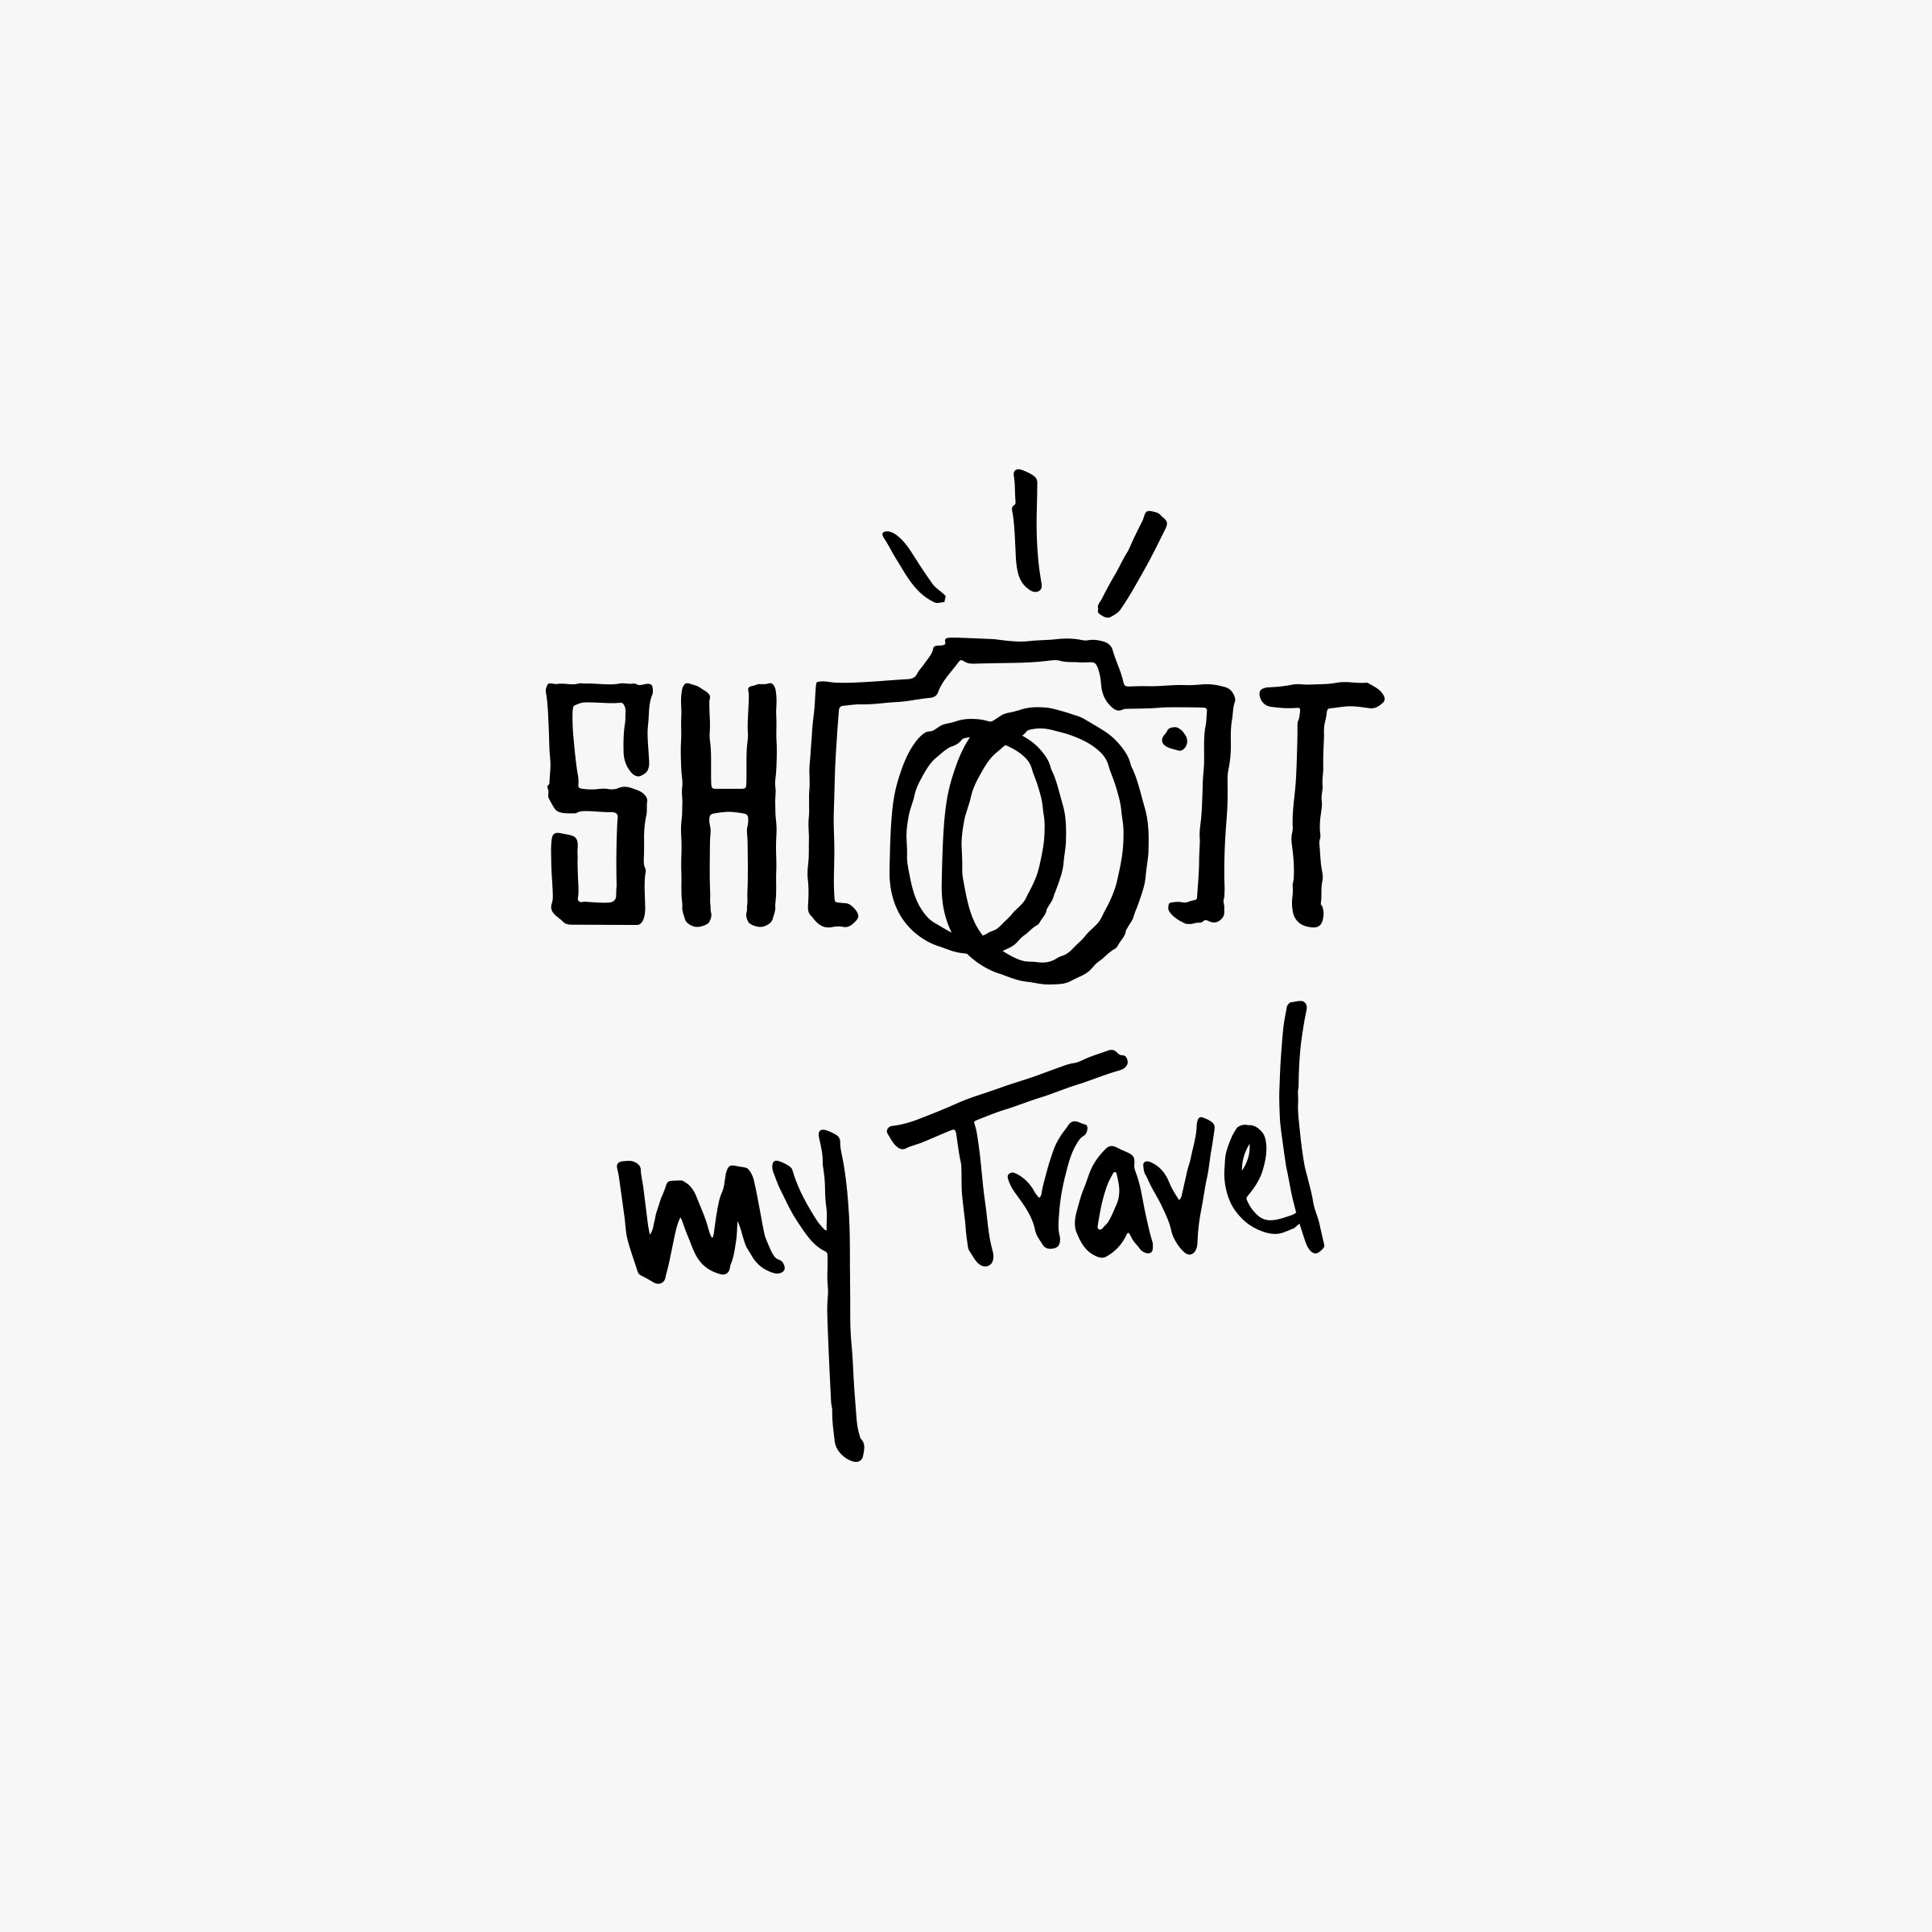 shoot-my-travel-logo-design-by-create.jpg